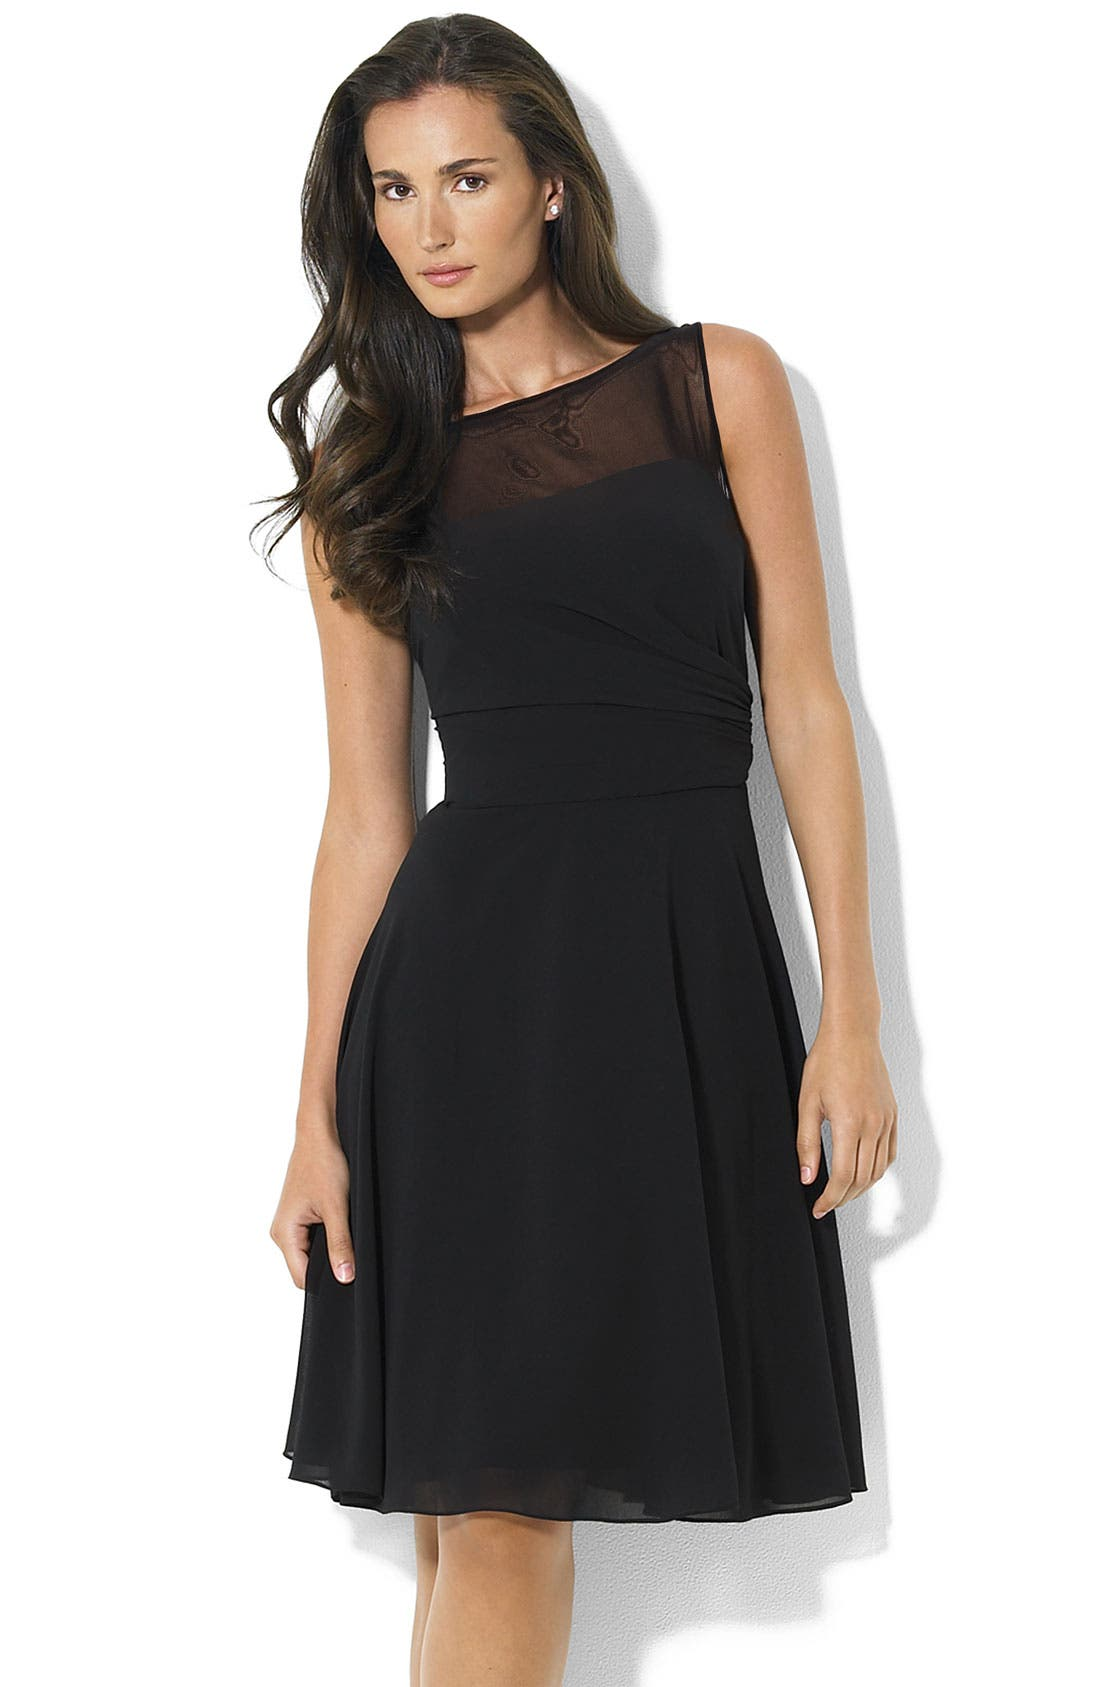 Alternate Image 1 Selected - Lauren by Ralph Lauren Chiffon Dress